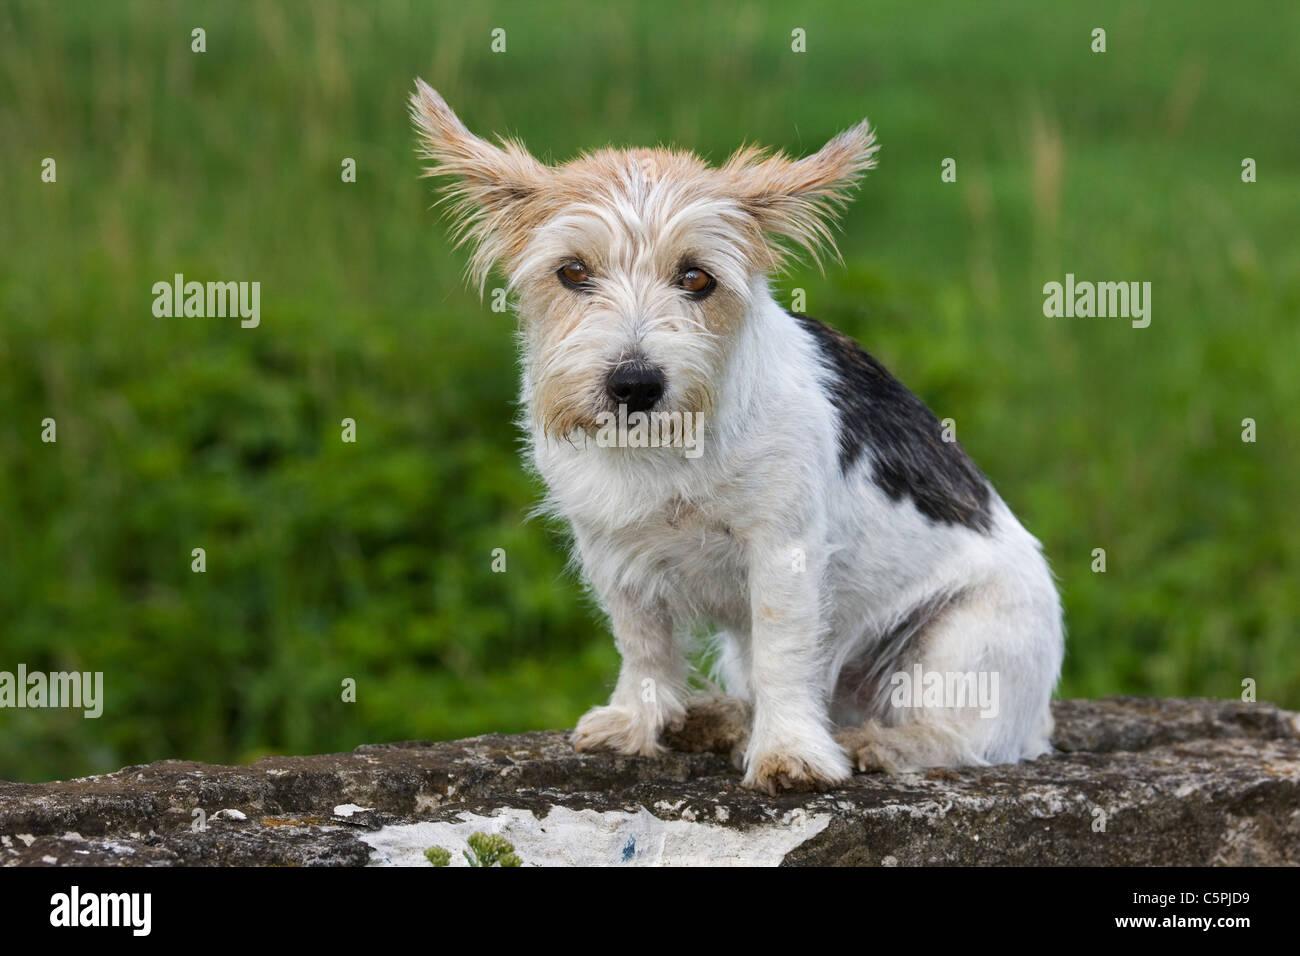 Rough-rivestito Jack Russell Terrier (Canis lupus familiaris) in giardino Immagini Stock